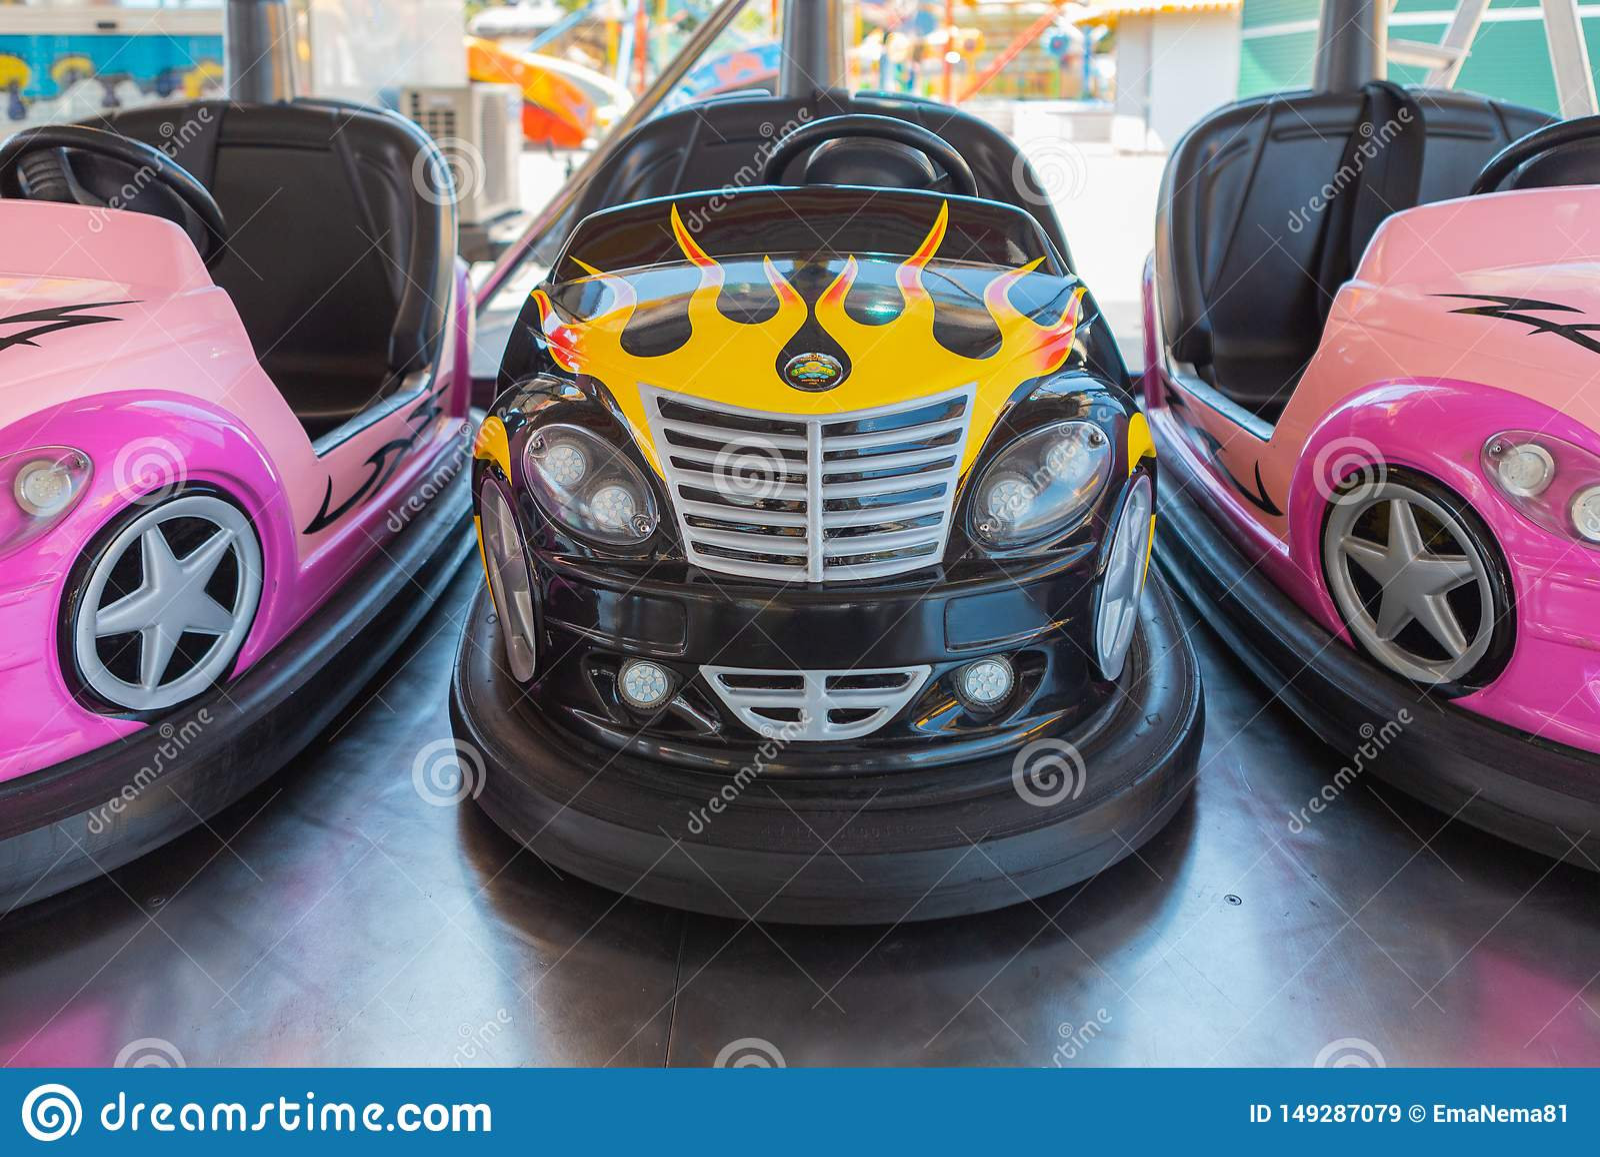 Kleine farbige Autoskooters f?r Kinder